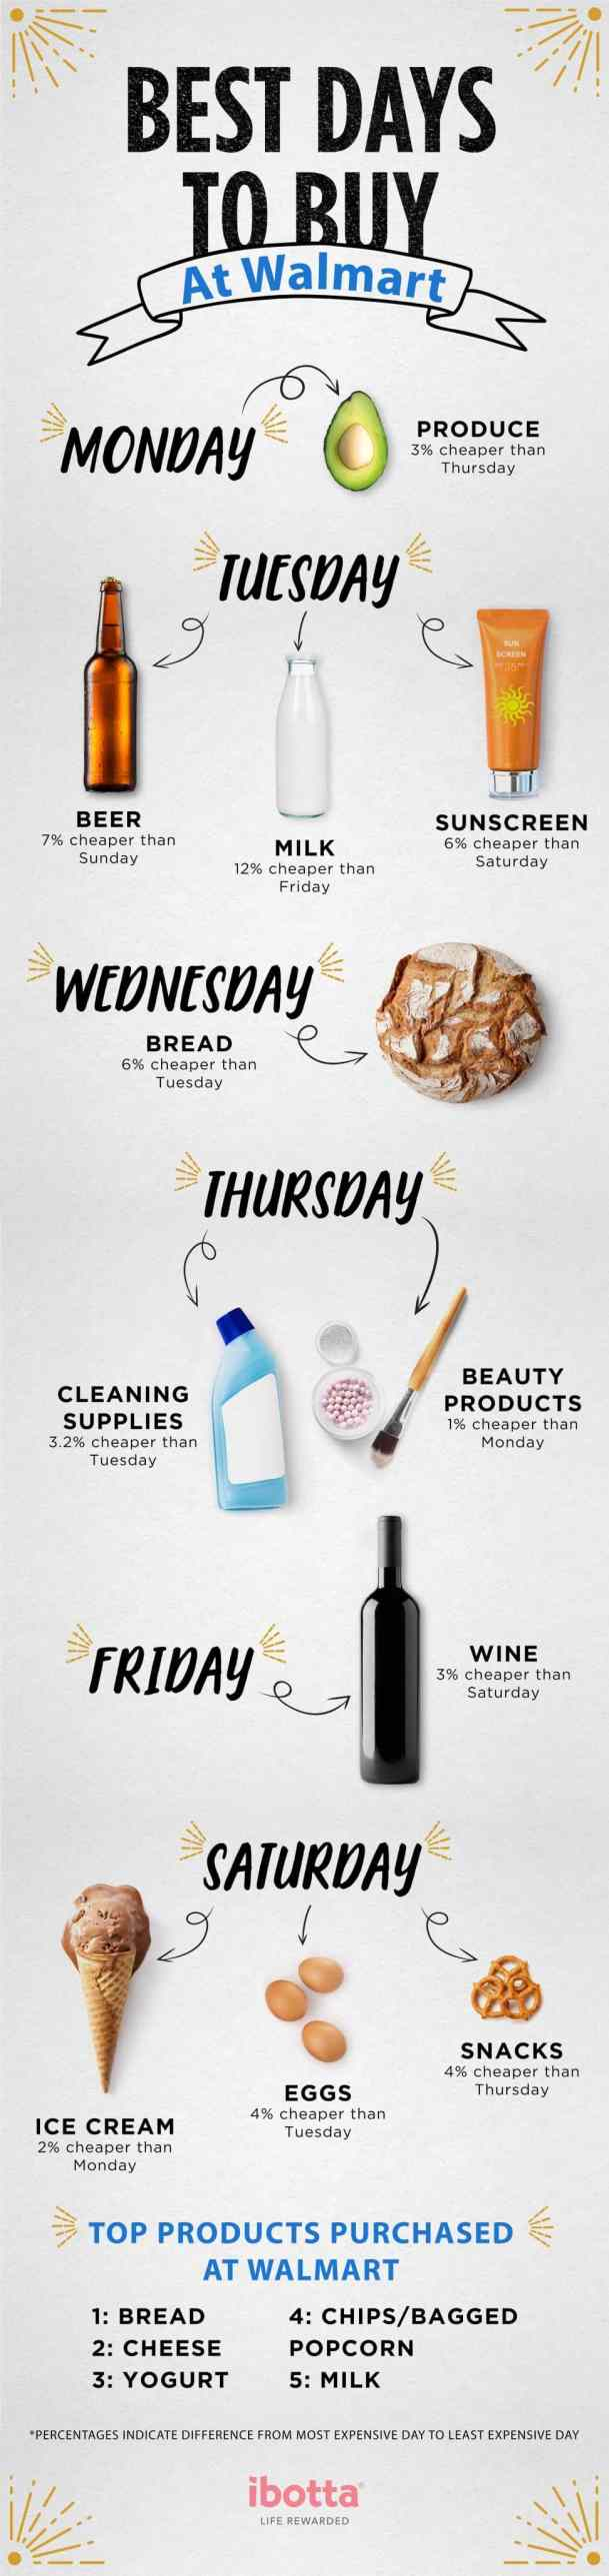 Walmart Best Days to Buy | Ibotta | #earnrewards #ibotta